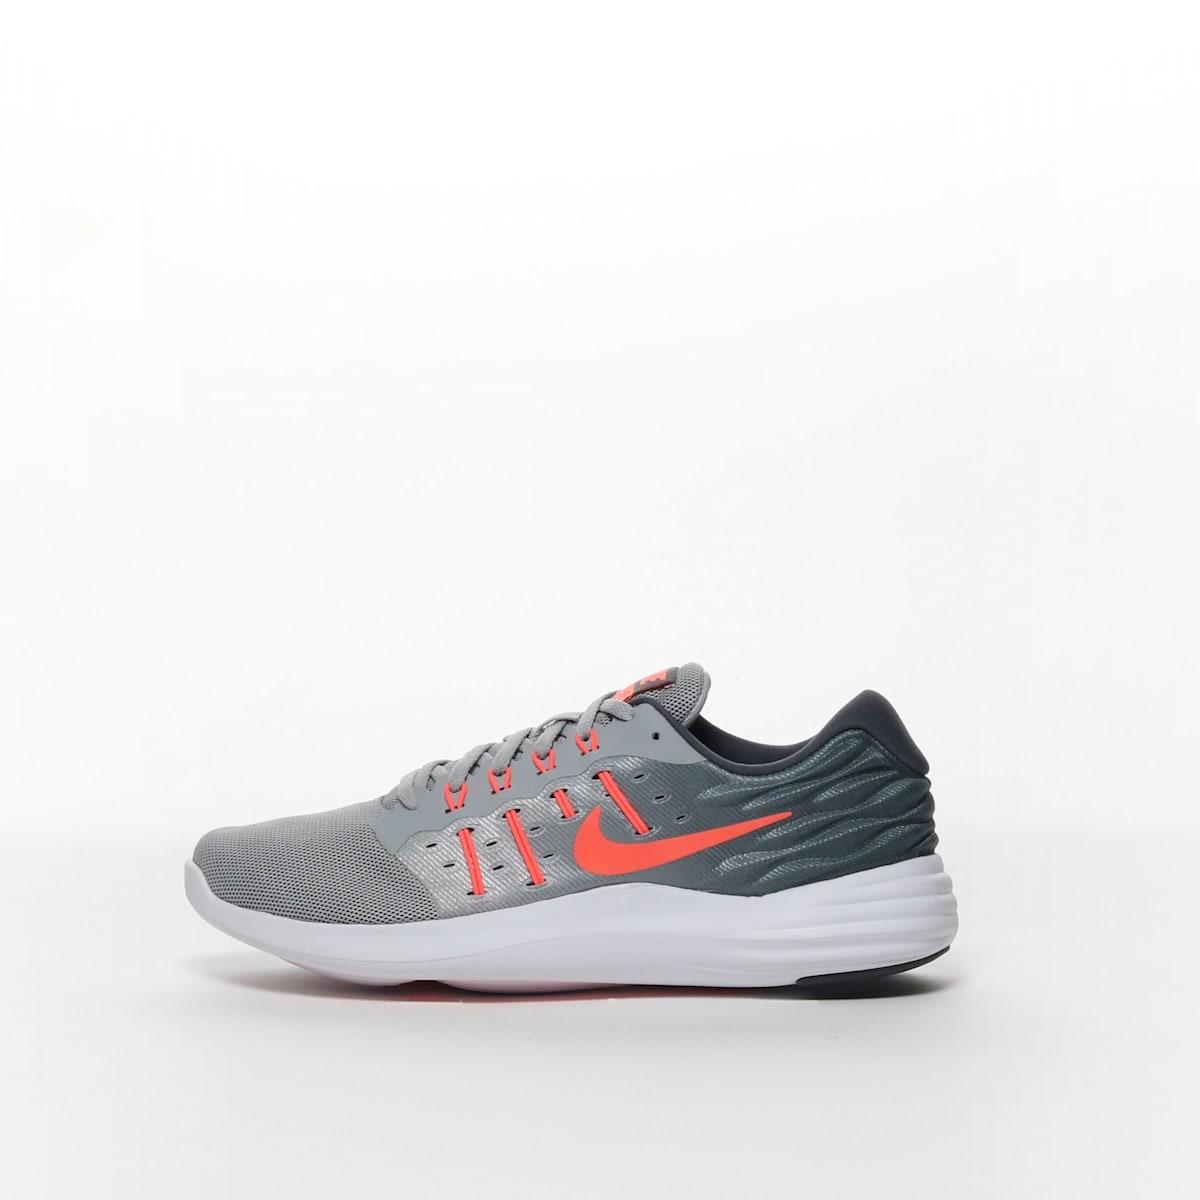 99ba93ea1dce Women s Nike LunarStelos Running Shoe - WLFGRY BMANGO – Resku